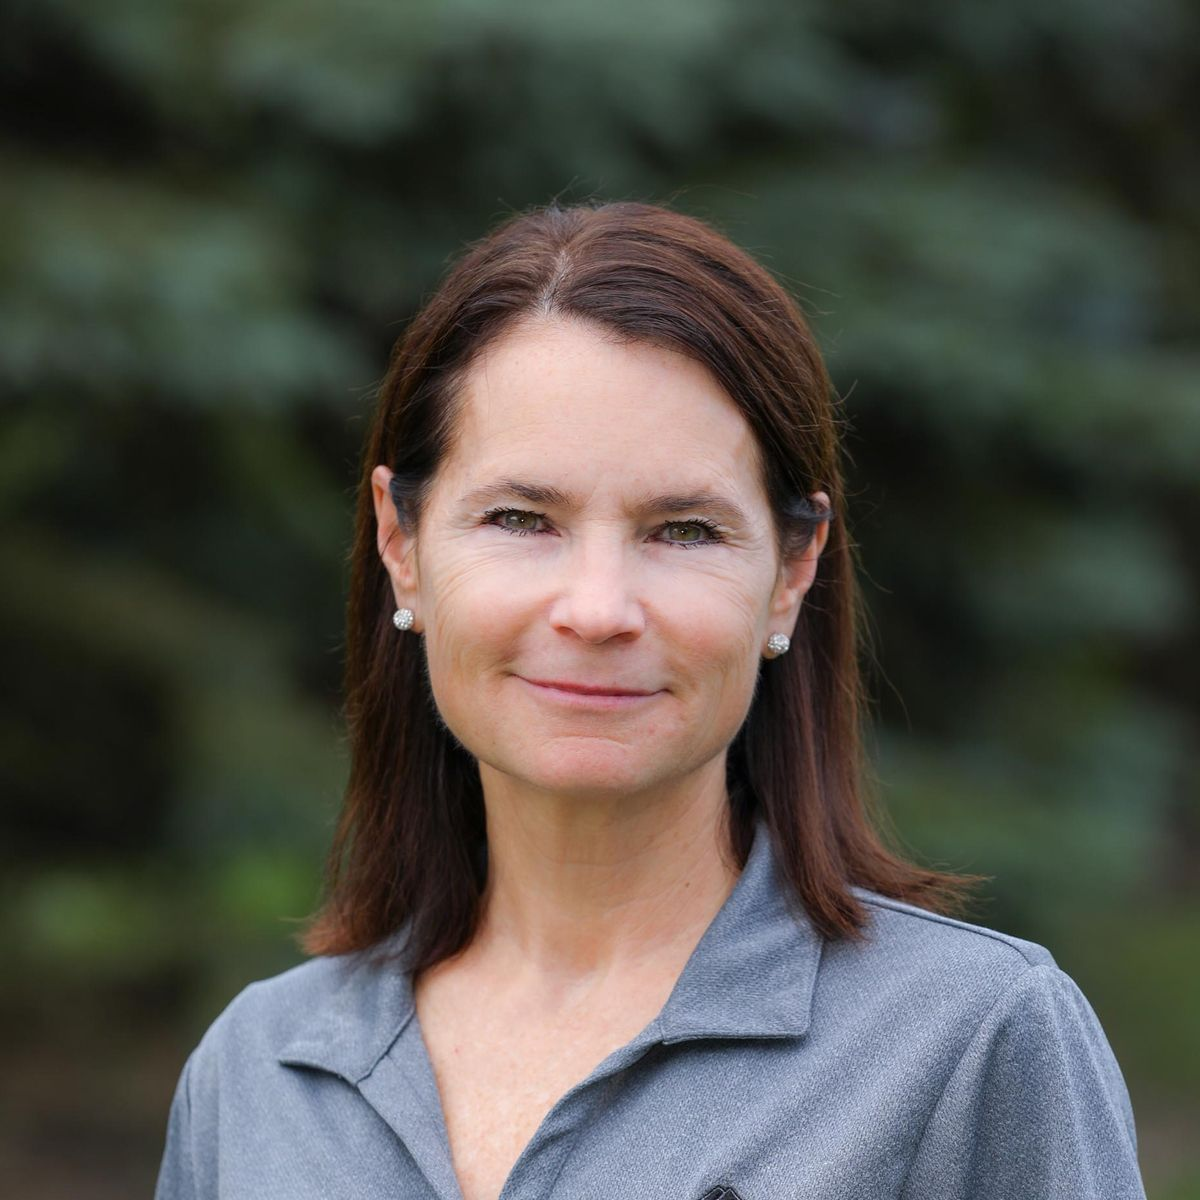 Becky Treneff